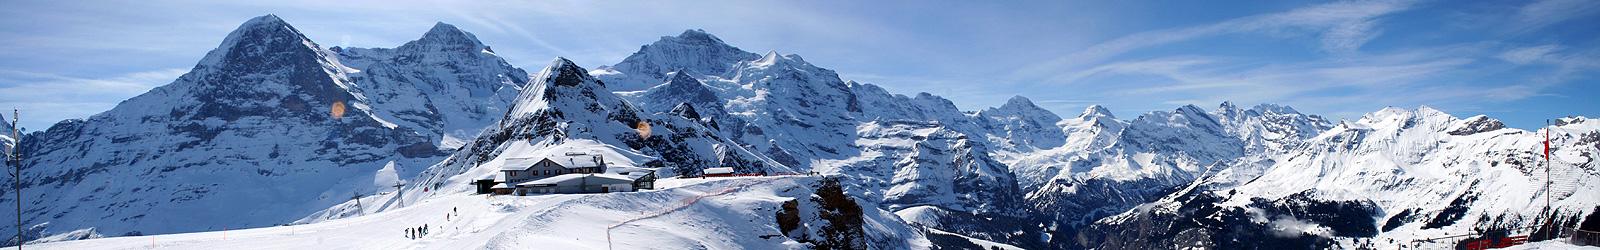 slider-svizzera3